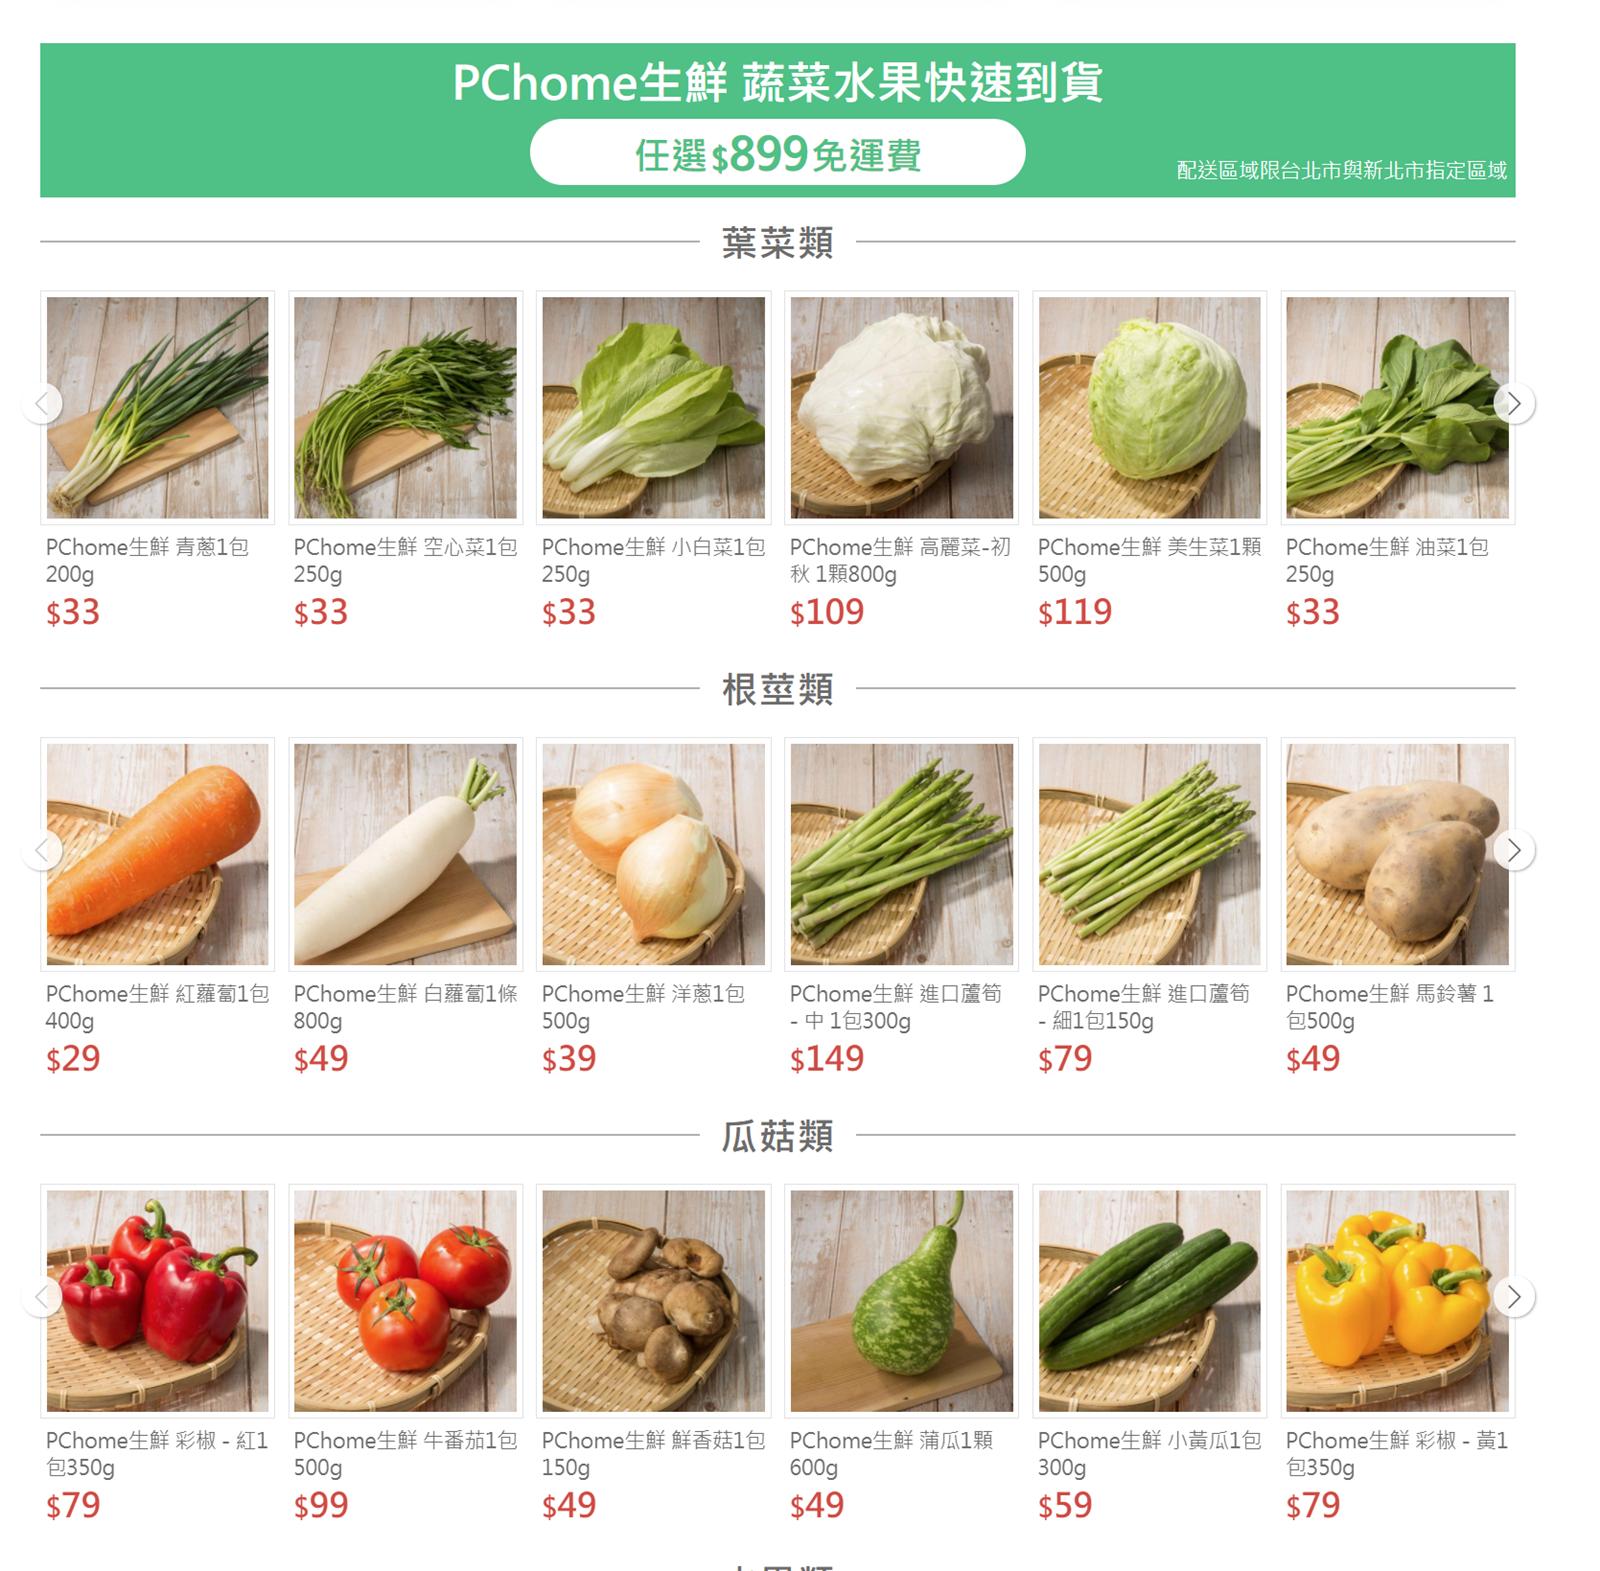 2021-07-15-18_20_36-PChome 生鮮【PChome24h 購物】.png @3C 達人廖阿輝